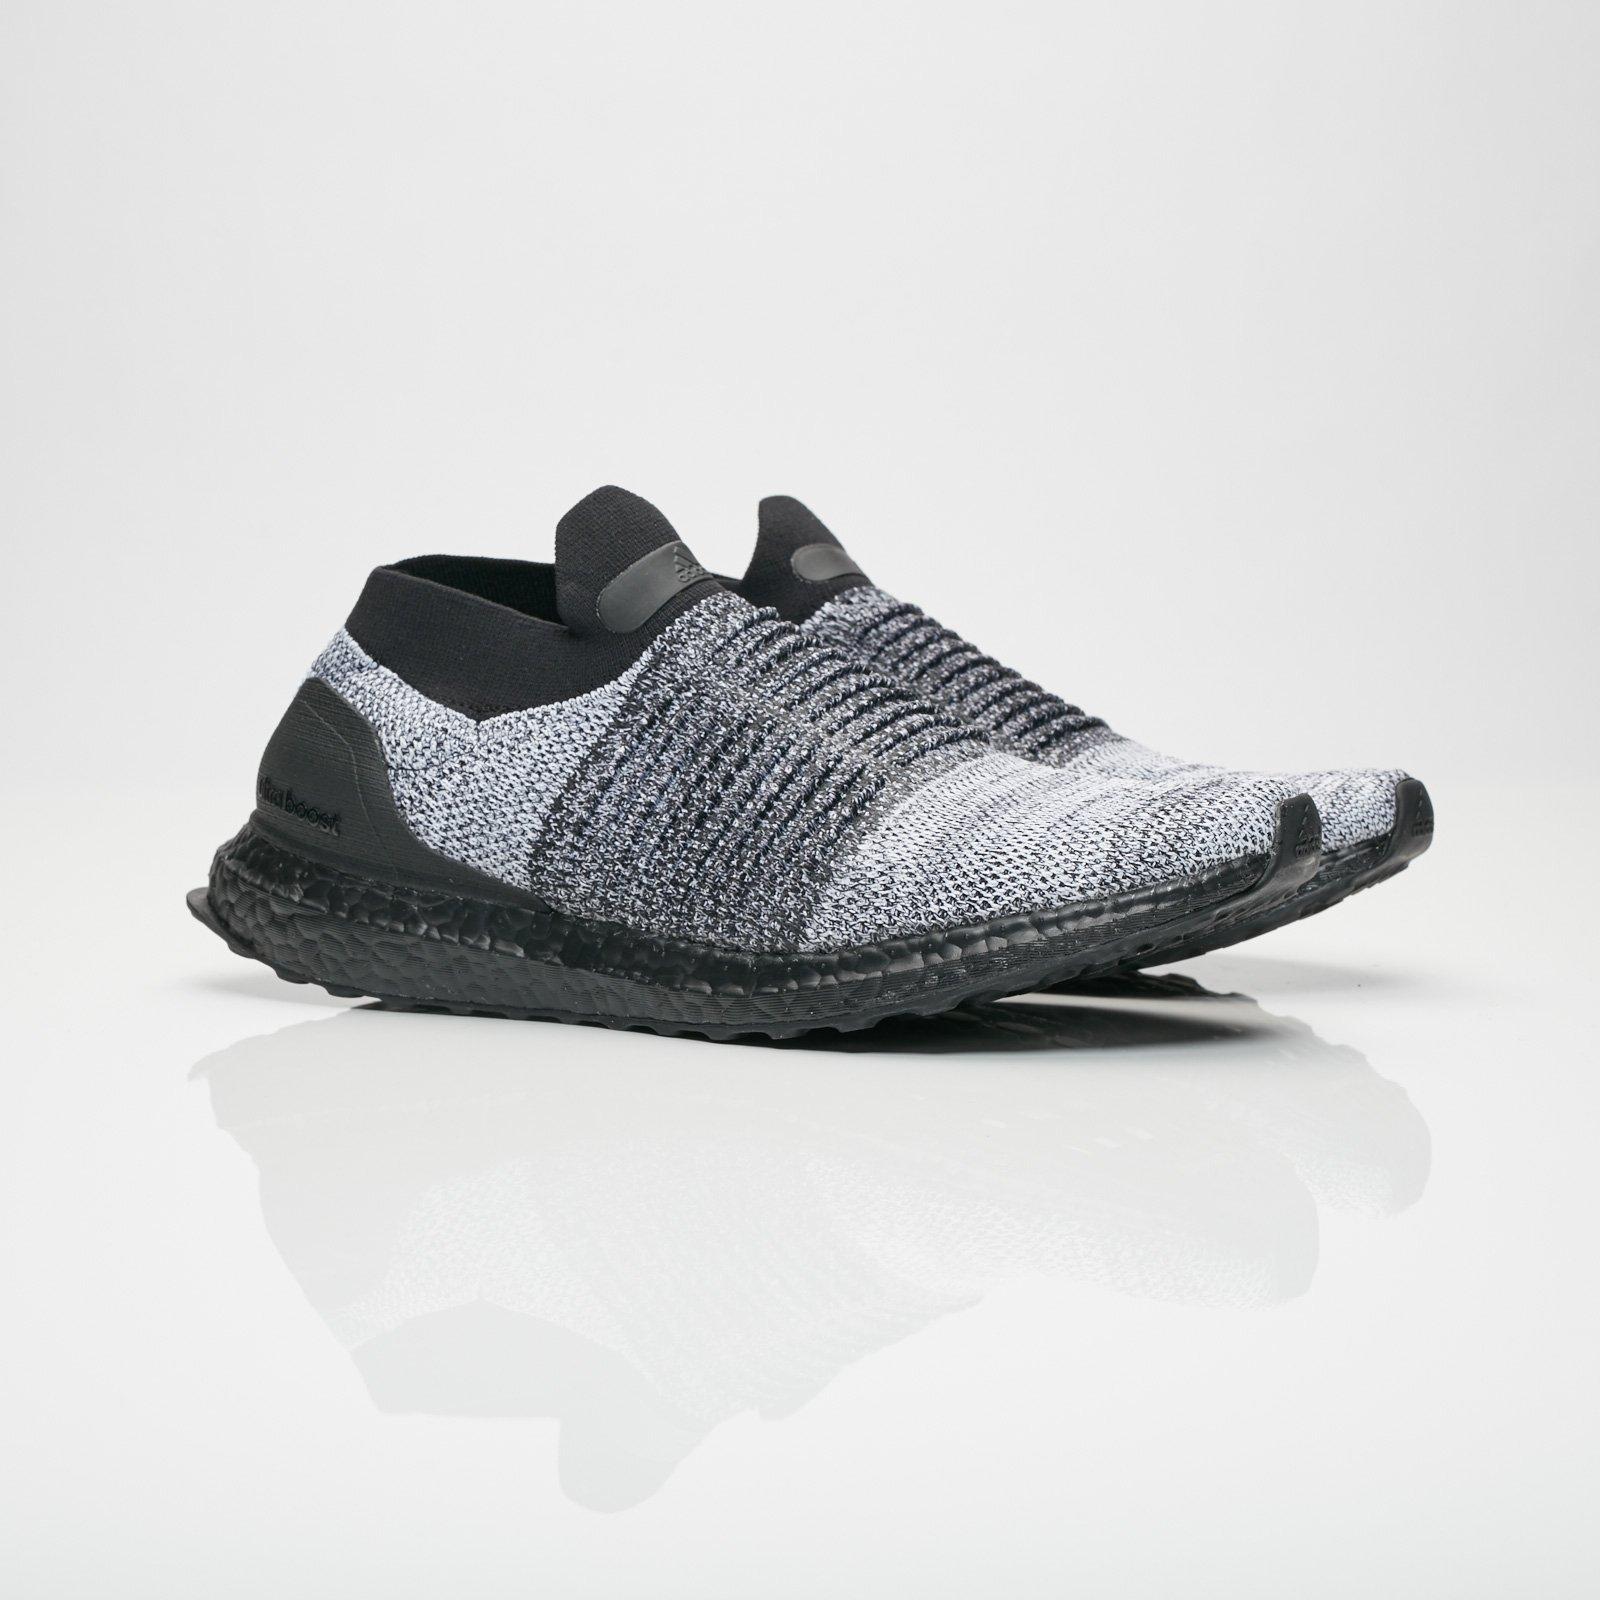 adidas ultraboost laceless bb6137 sneakersnstuff scarpe